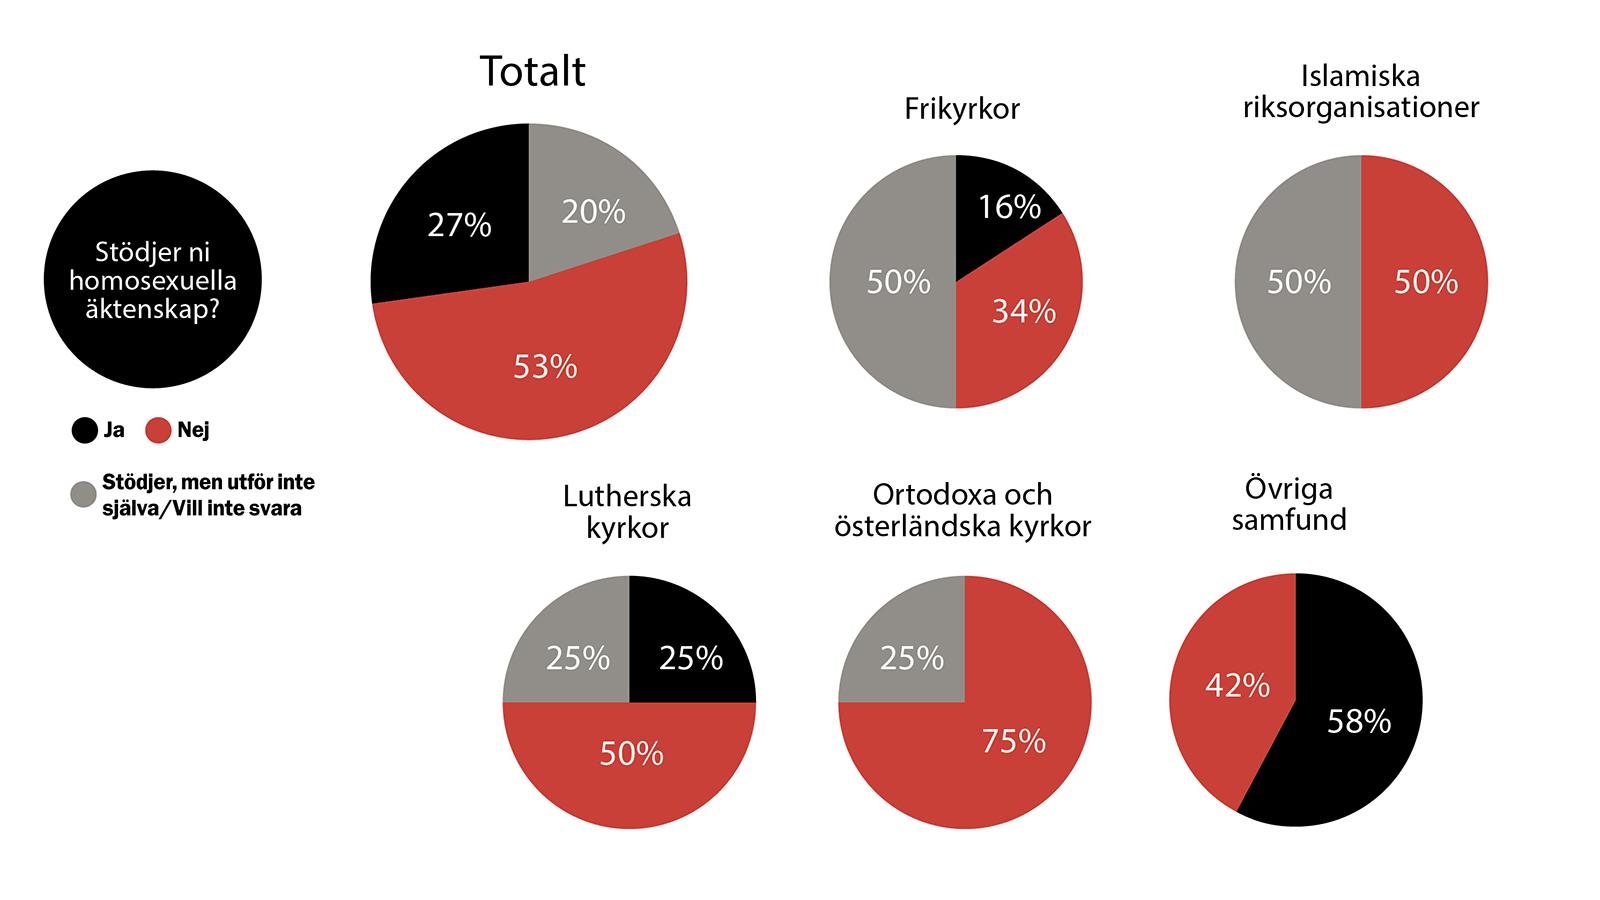 Svenska alliansmissionen homosexualitet